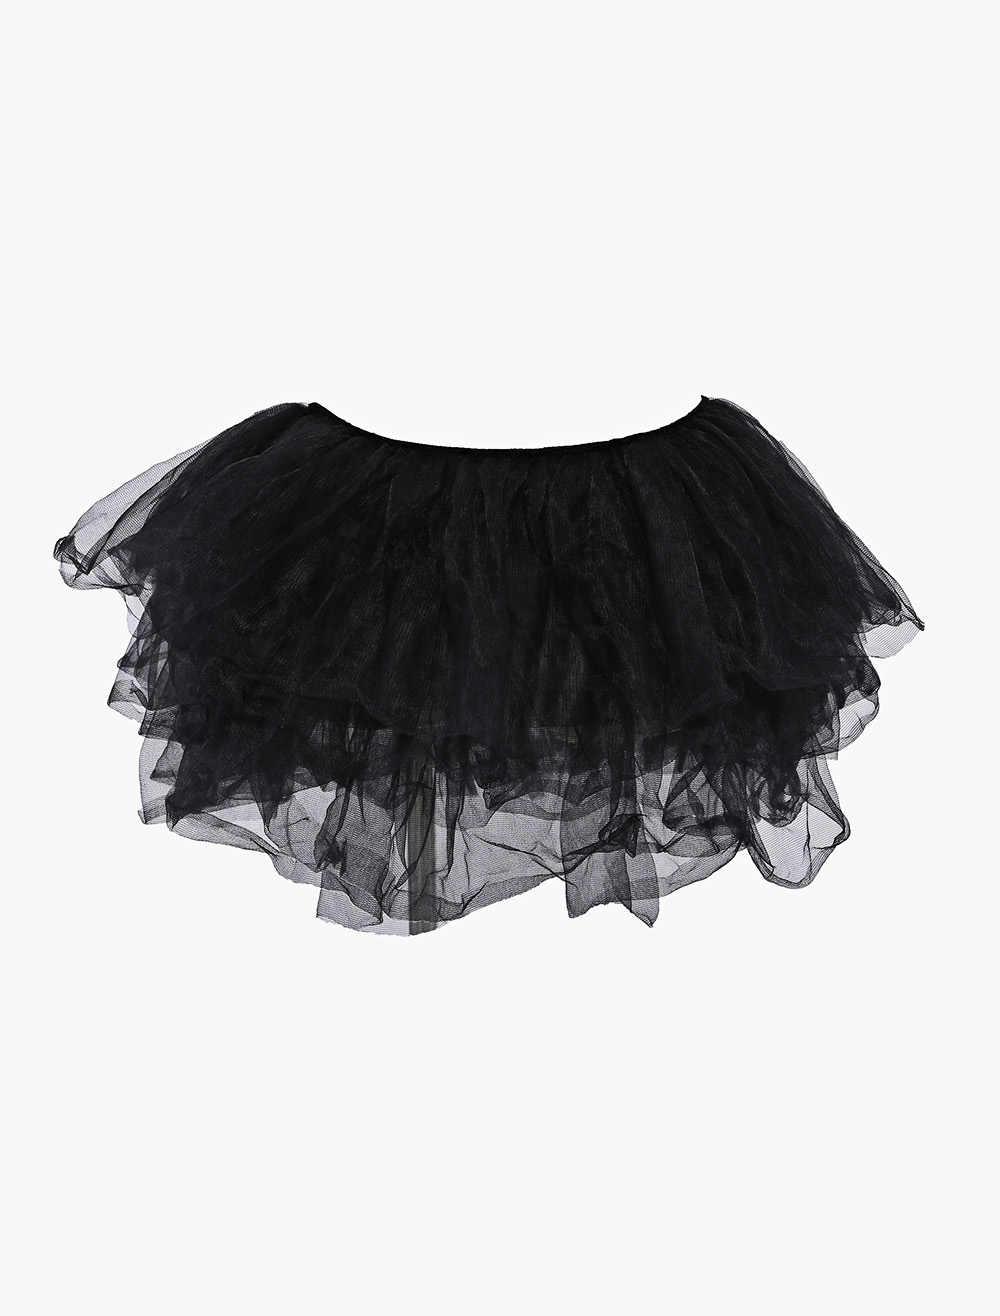 70bcee67b ... MOONIGHT Sexy Petticoat Satin Mini Tutu Skirt Ball Gown Ruffle Frilly  Corset Skirts